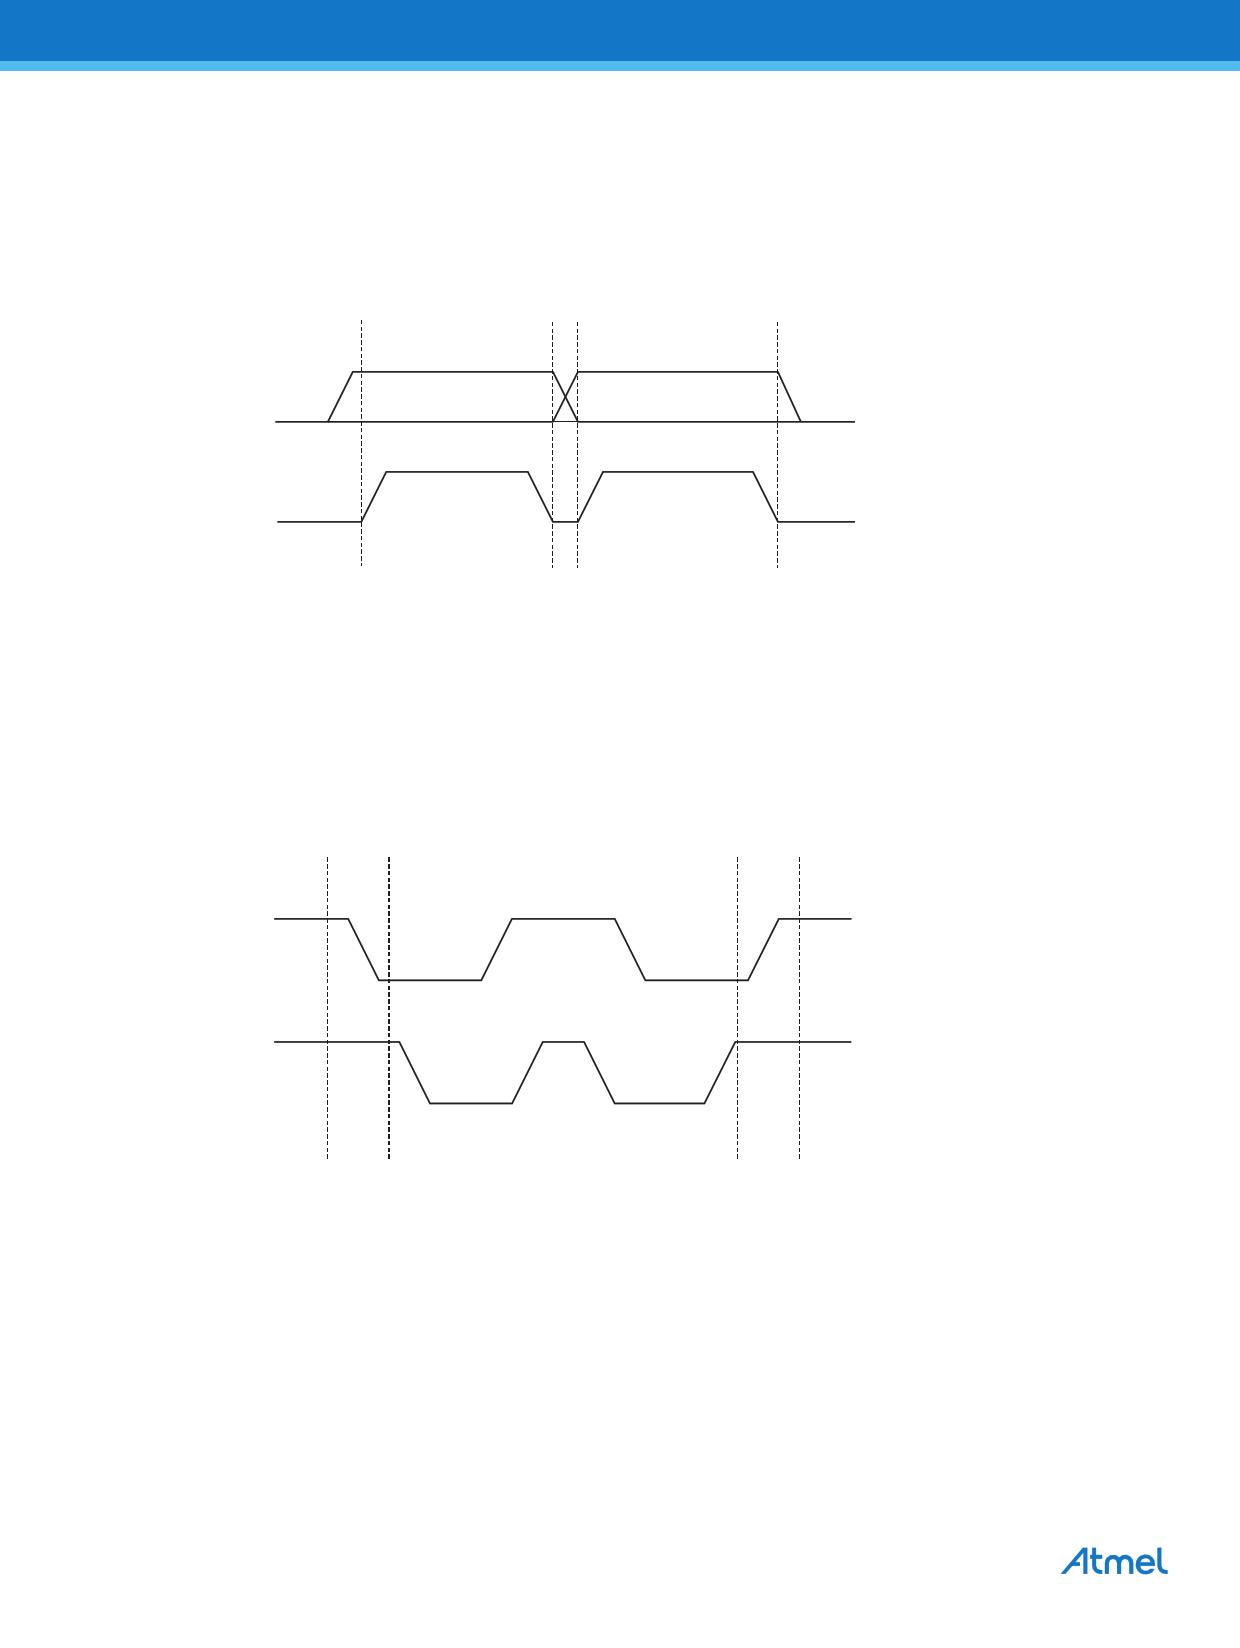 AT24C64D 電子部品, 半導体